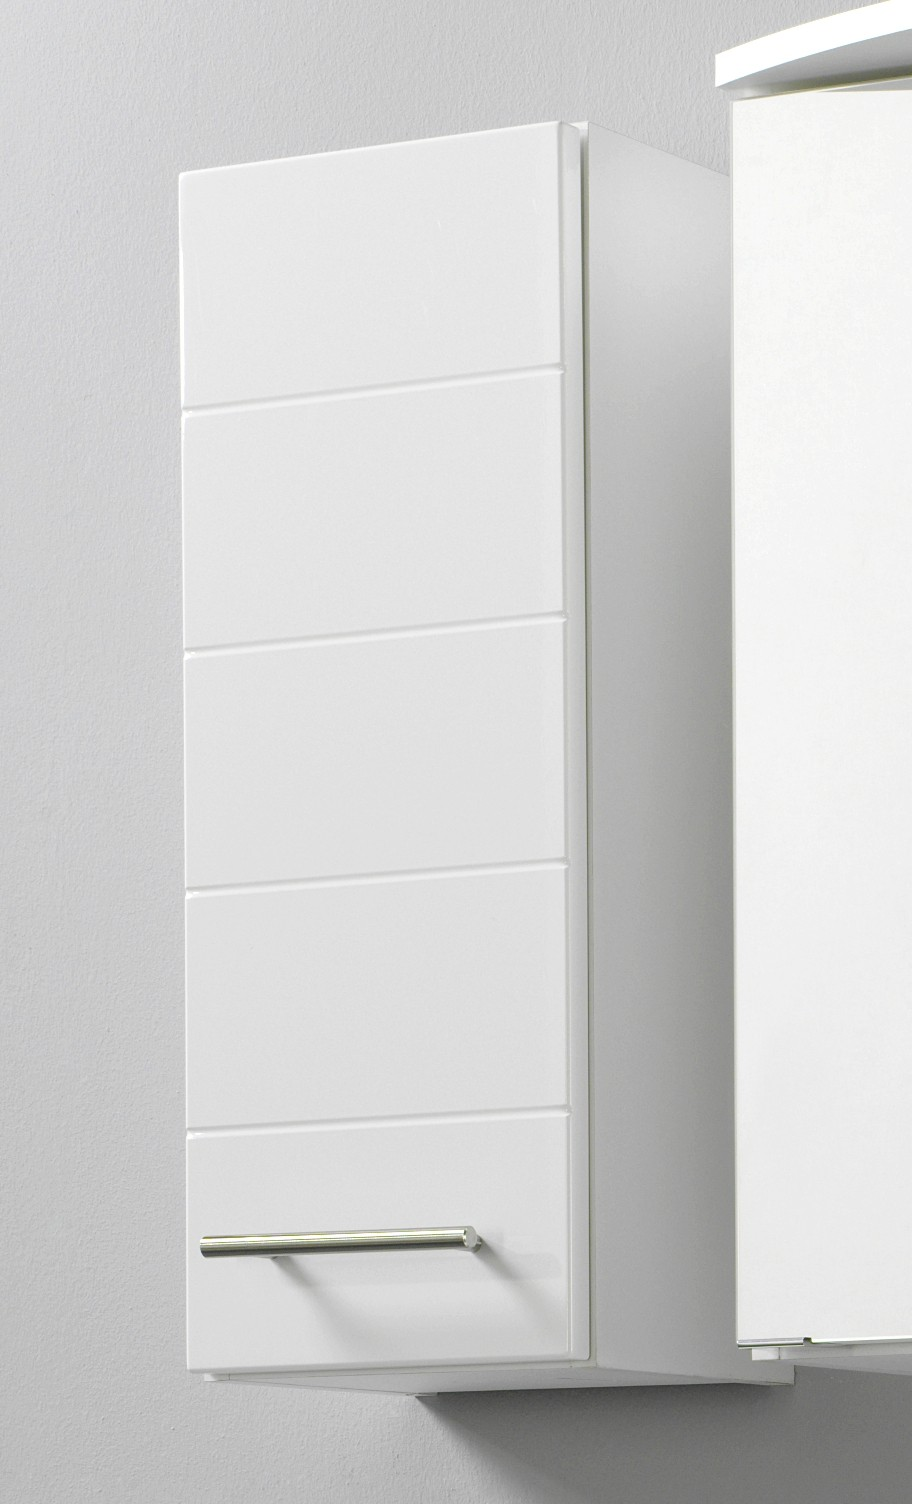 bad h ngeschrank rimini 1 t rig 25 cm breit hochglanz wei bad rimini. Black Bedroom Furniture Sets. Home Design Ideas